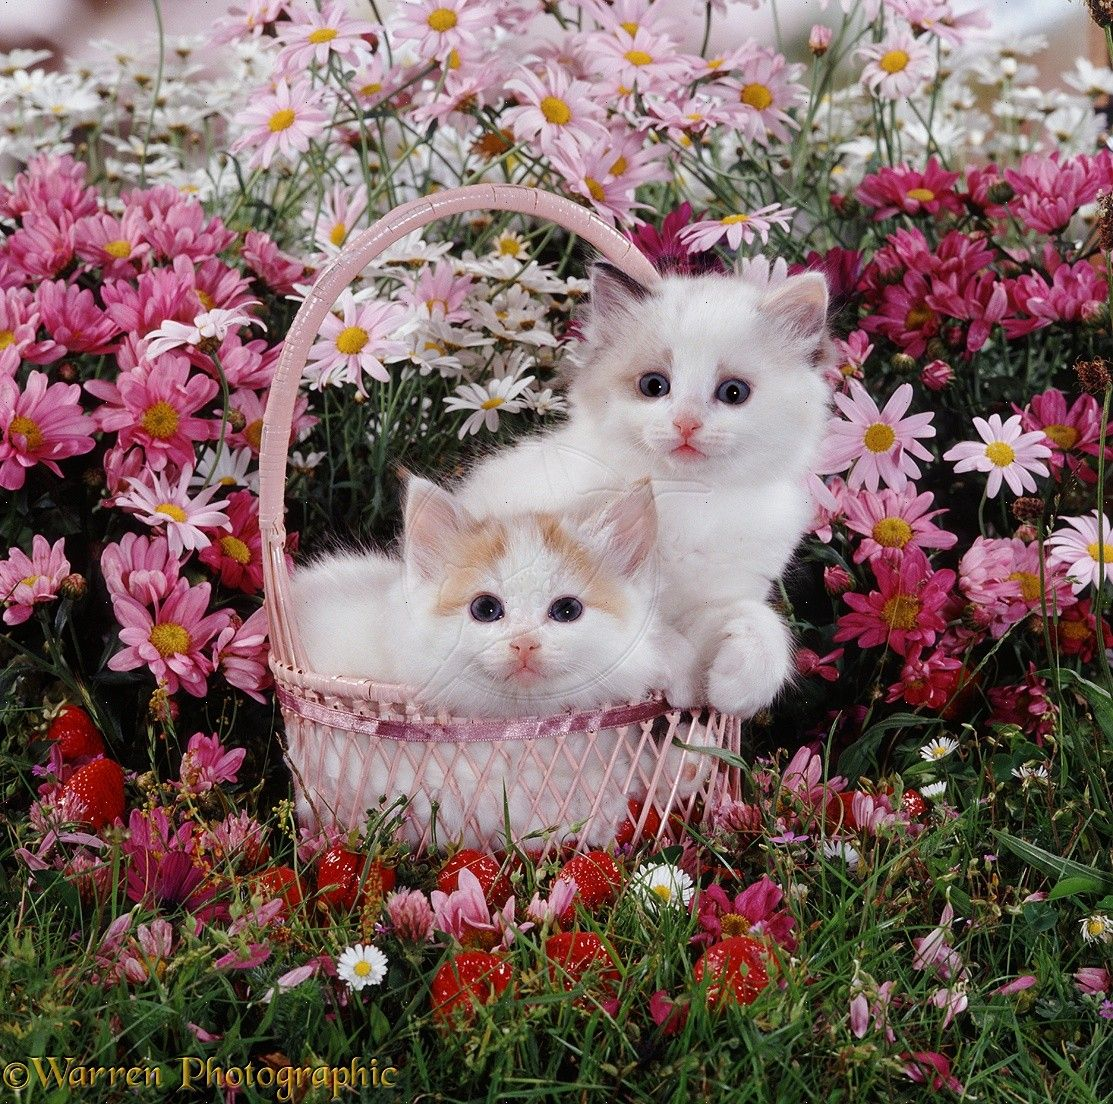 basket of flowers kittens in a strawberry basket